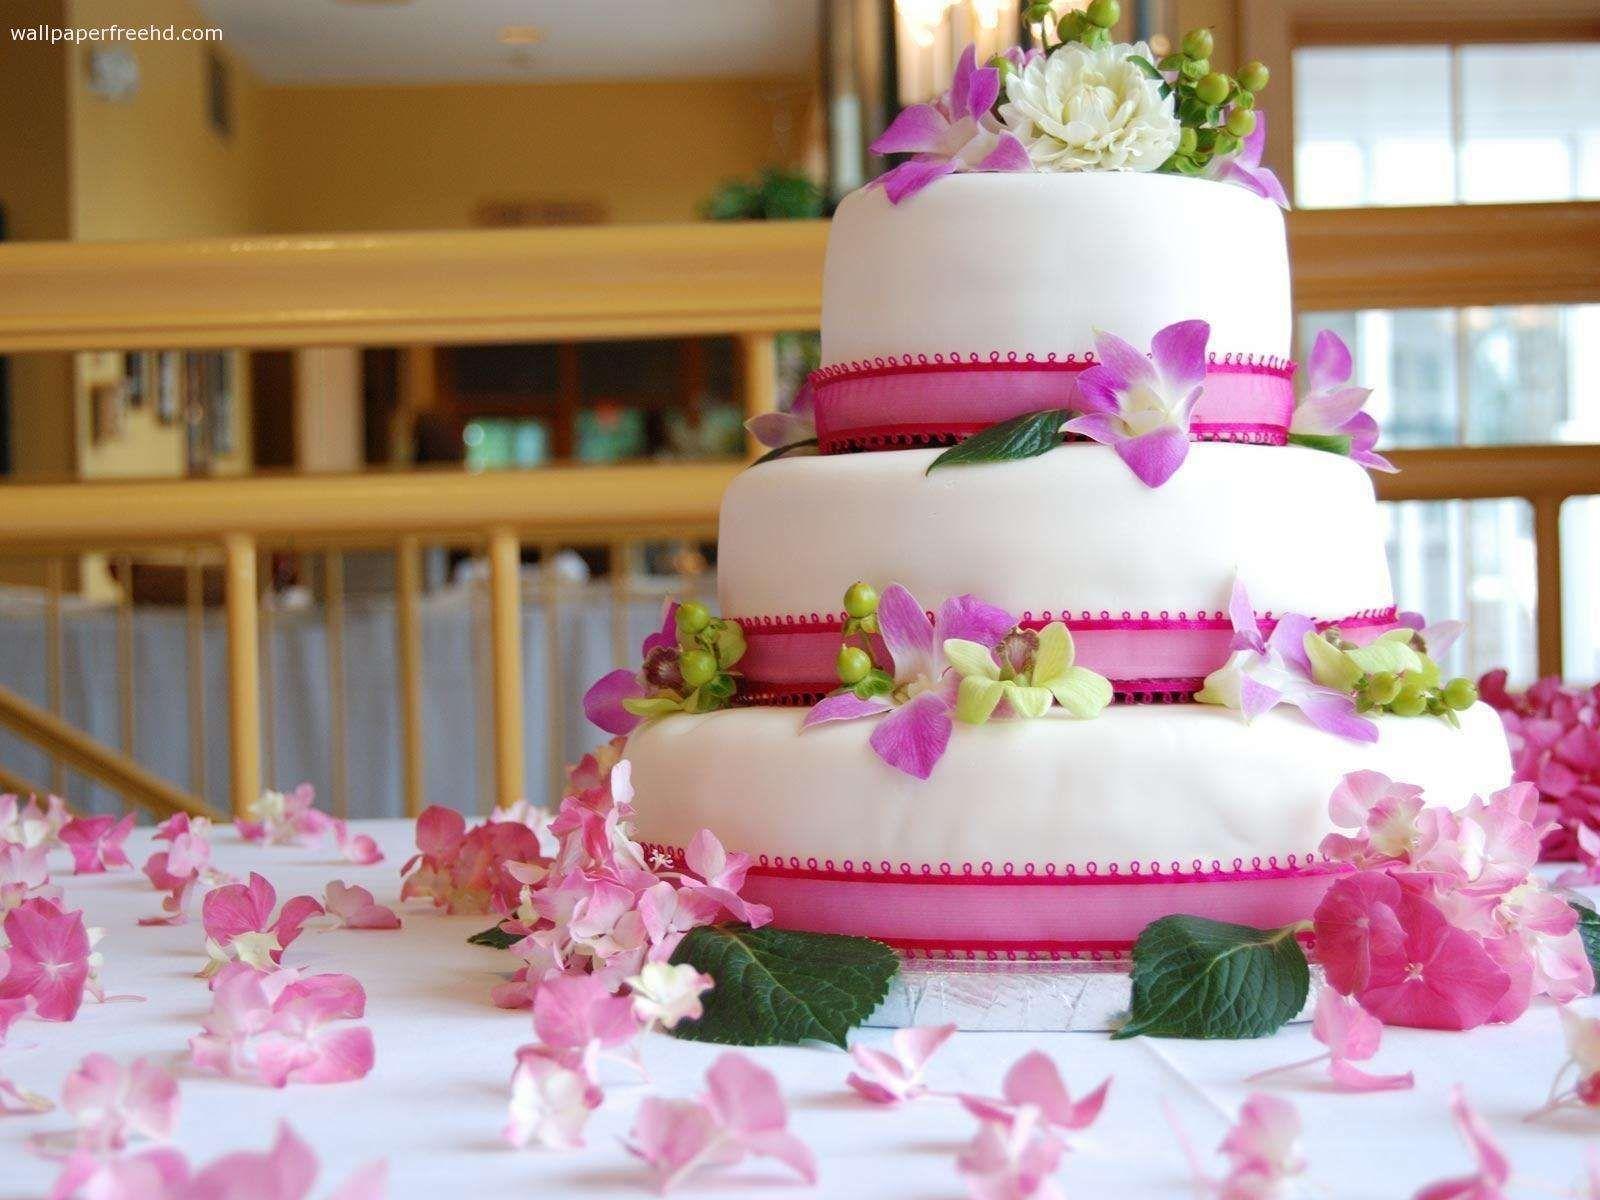 Pink Wedding Cakes 1080p Hd Pictures Wedding Cakes Birthday Cake